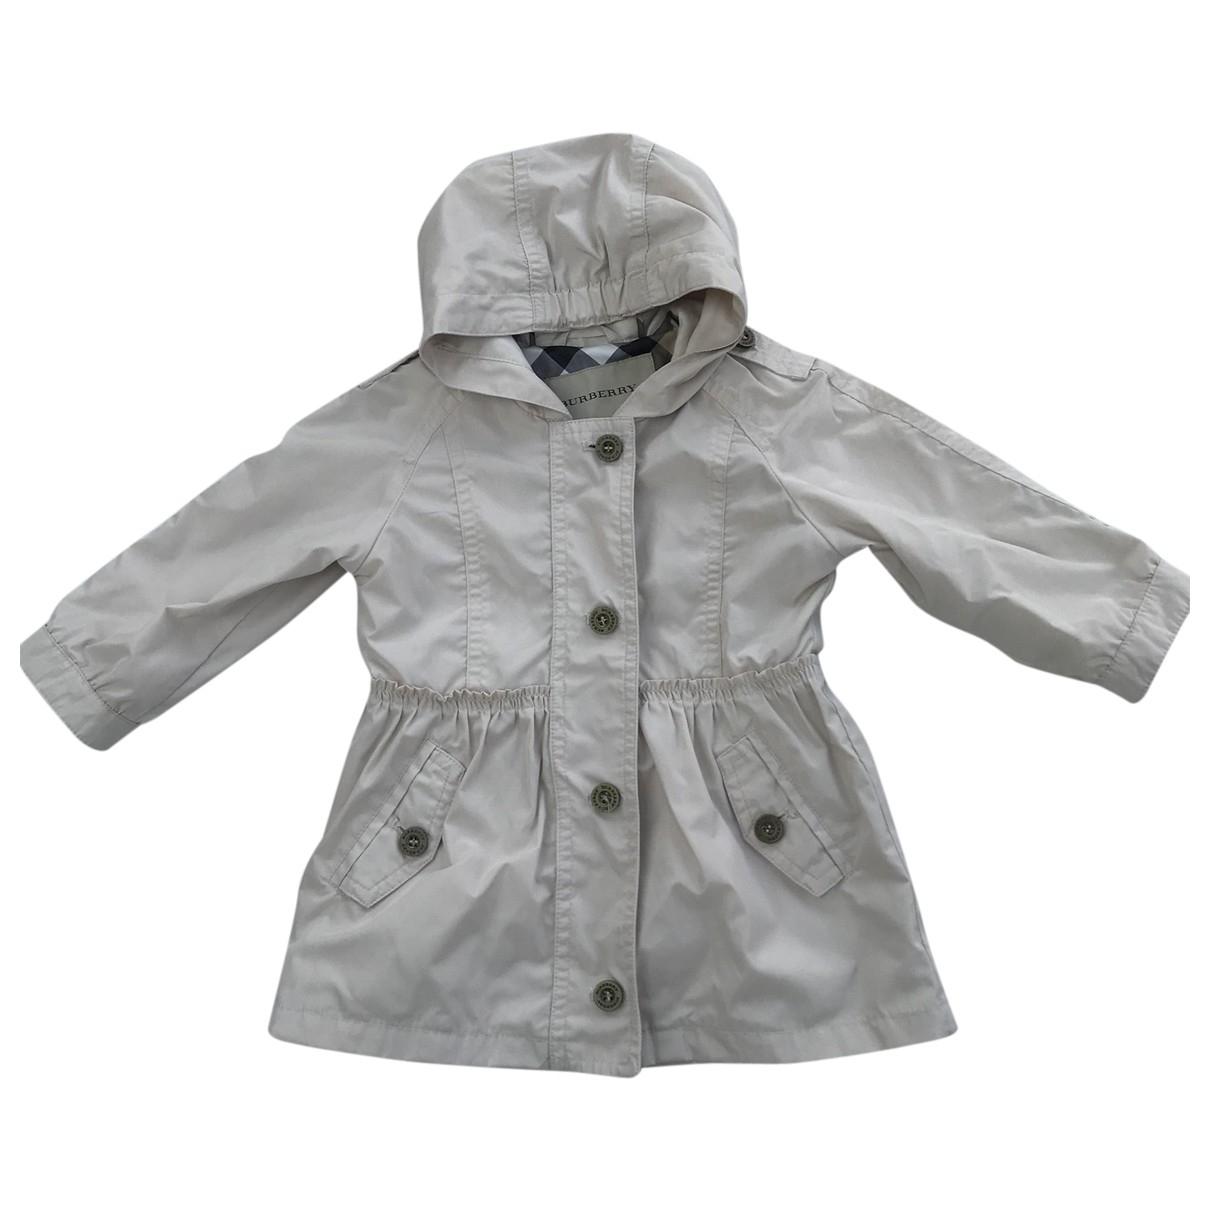 Burberry \N Beige jacket & coat for Kids 12 months - up to 74cm FR